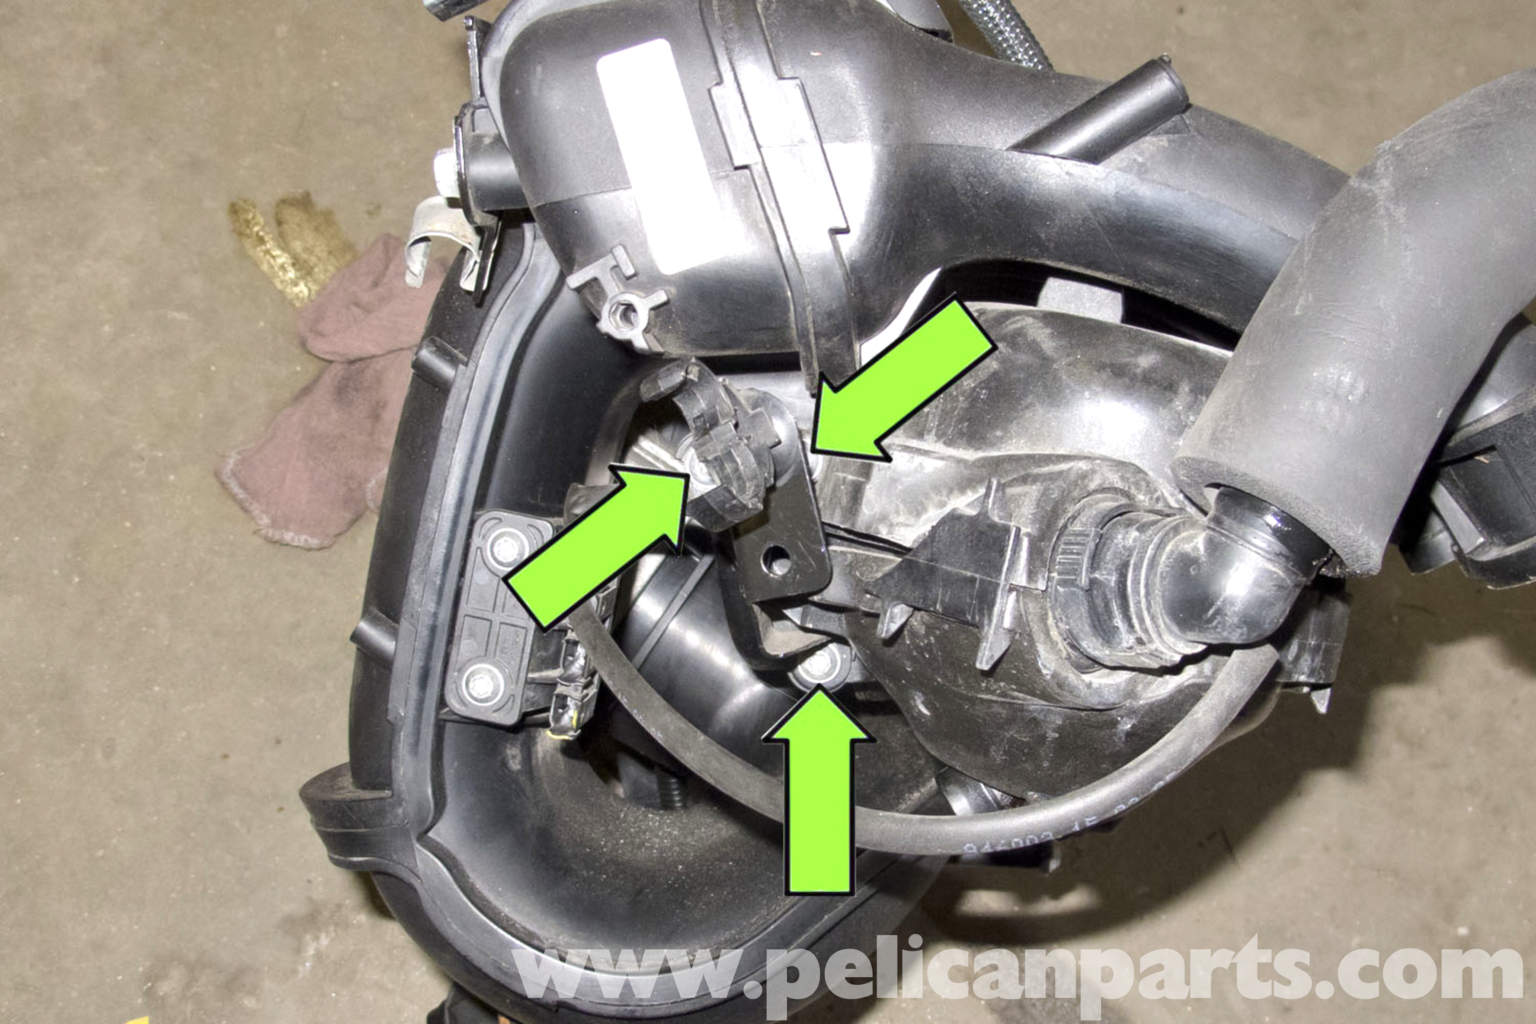 BMW E90 Crankcase Breather Valve Replacement | E91, E92, E93 | Pelican Parts DIY Maintenance Article